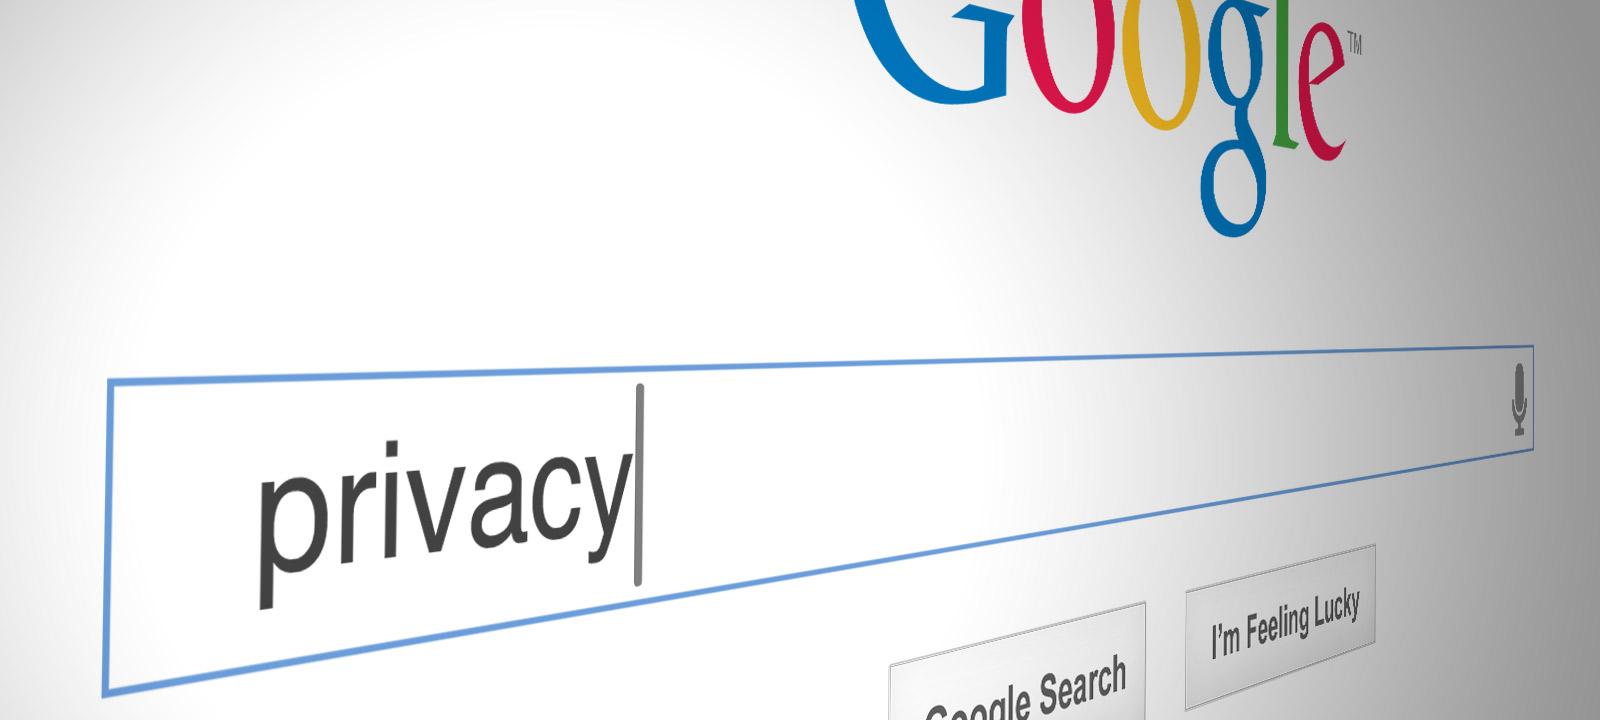 http://www.privacyofficertoscana.eu/wp-content/uploads/2014/05/google-privacy.jpg